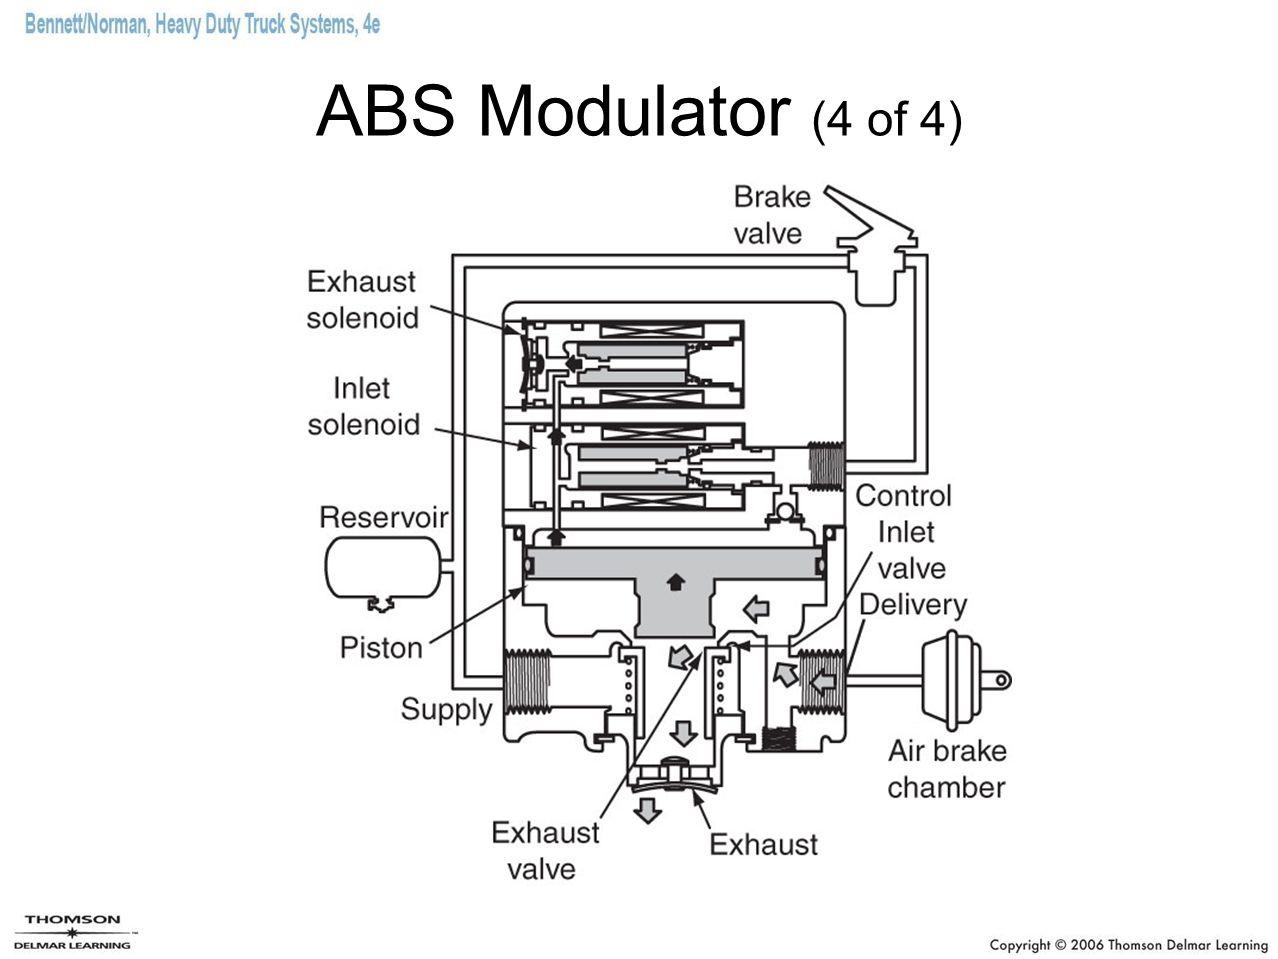 ABS Modulator (4 of 4)